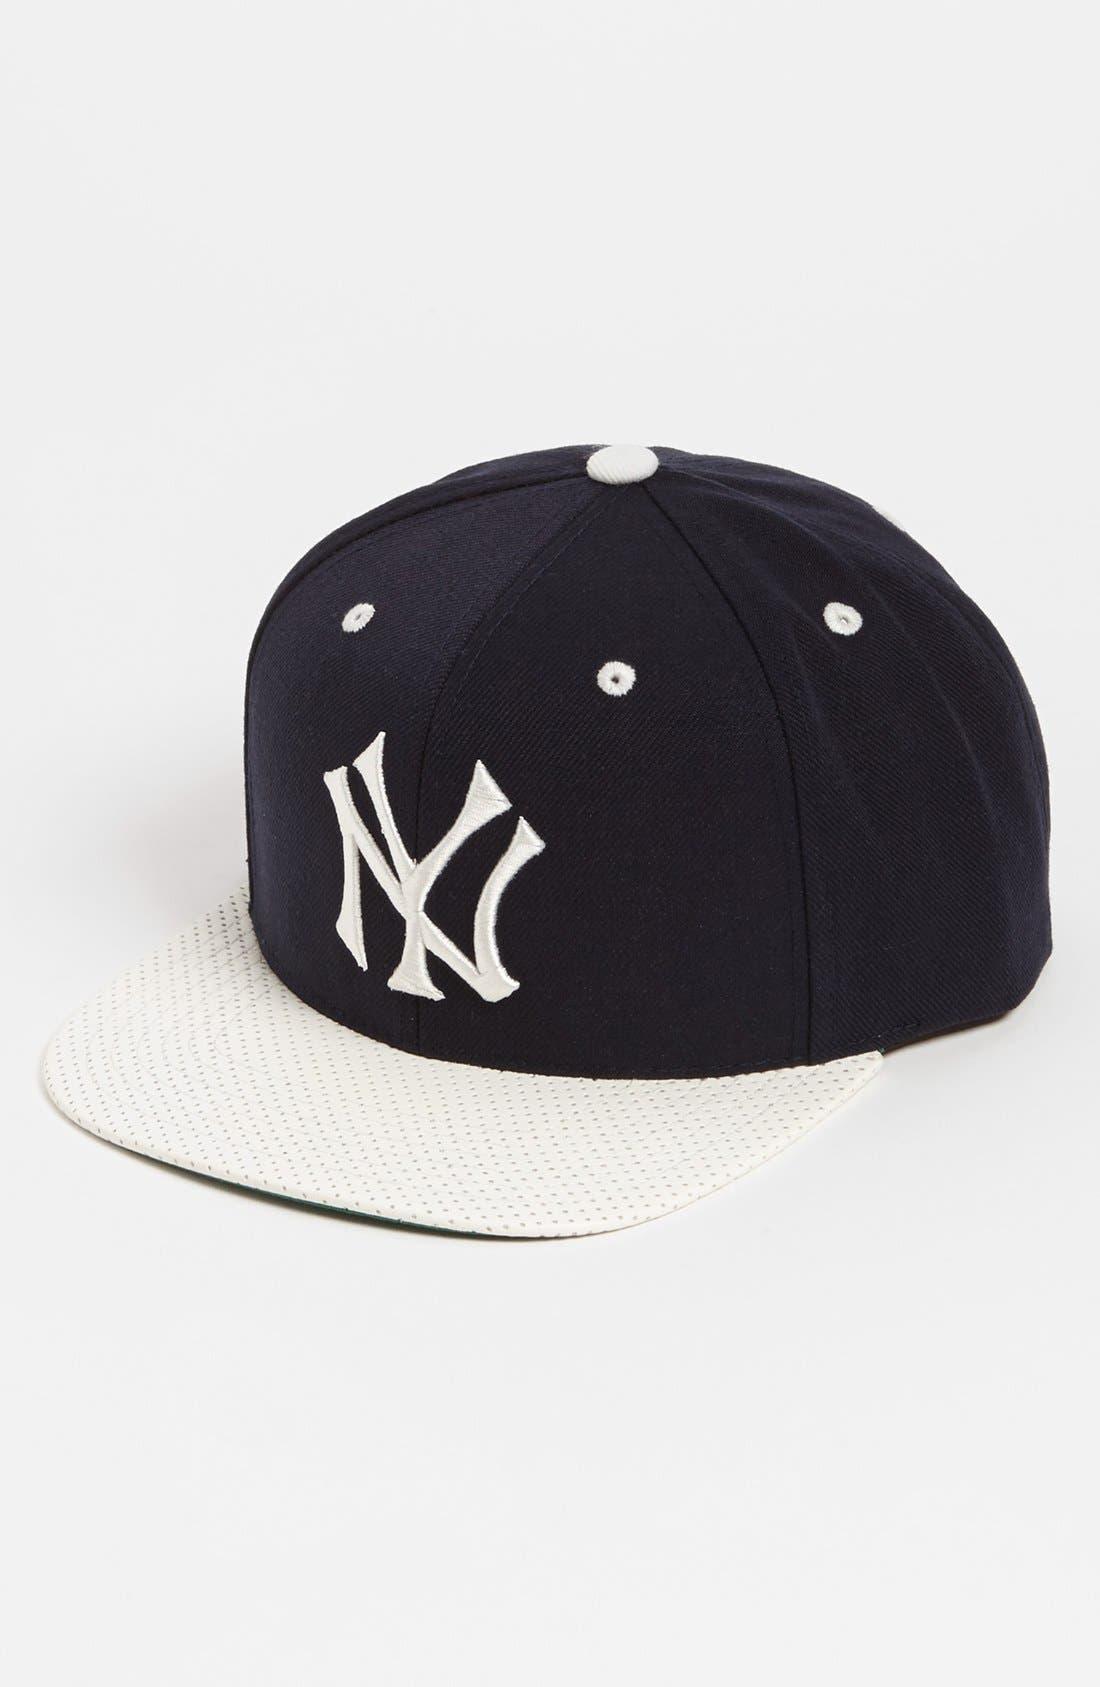 Main Image - American Needle 'New York Yankees - The Natural' Snapback Baseball Cap